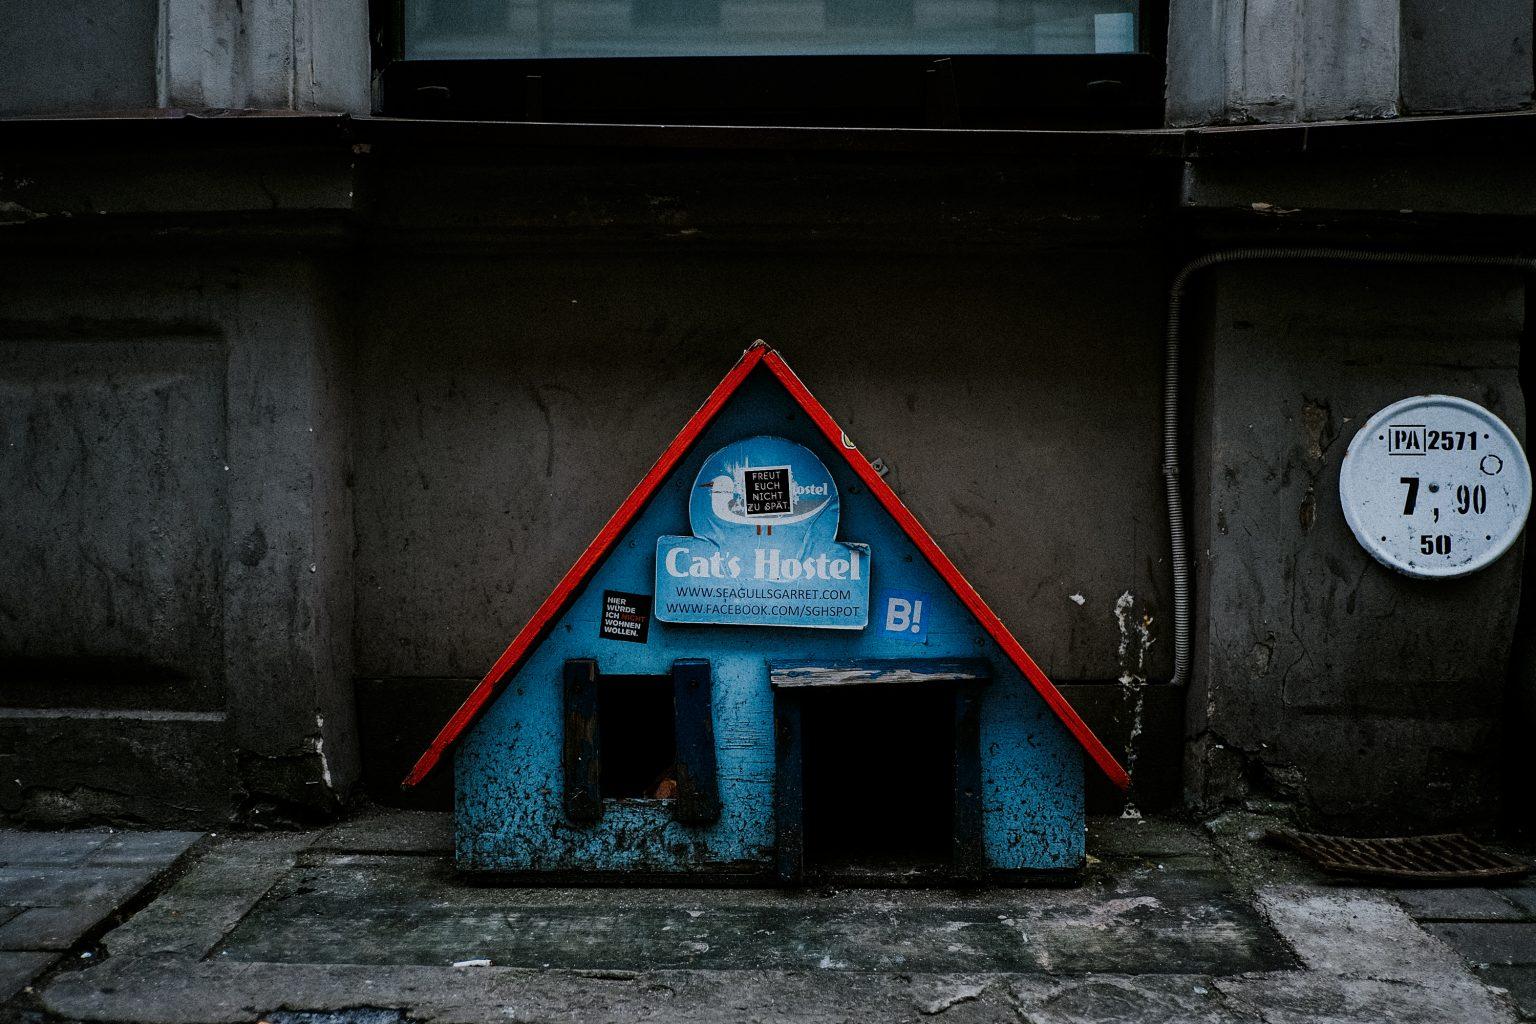 Katzenhotel in Riga